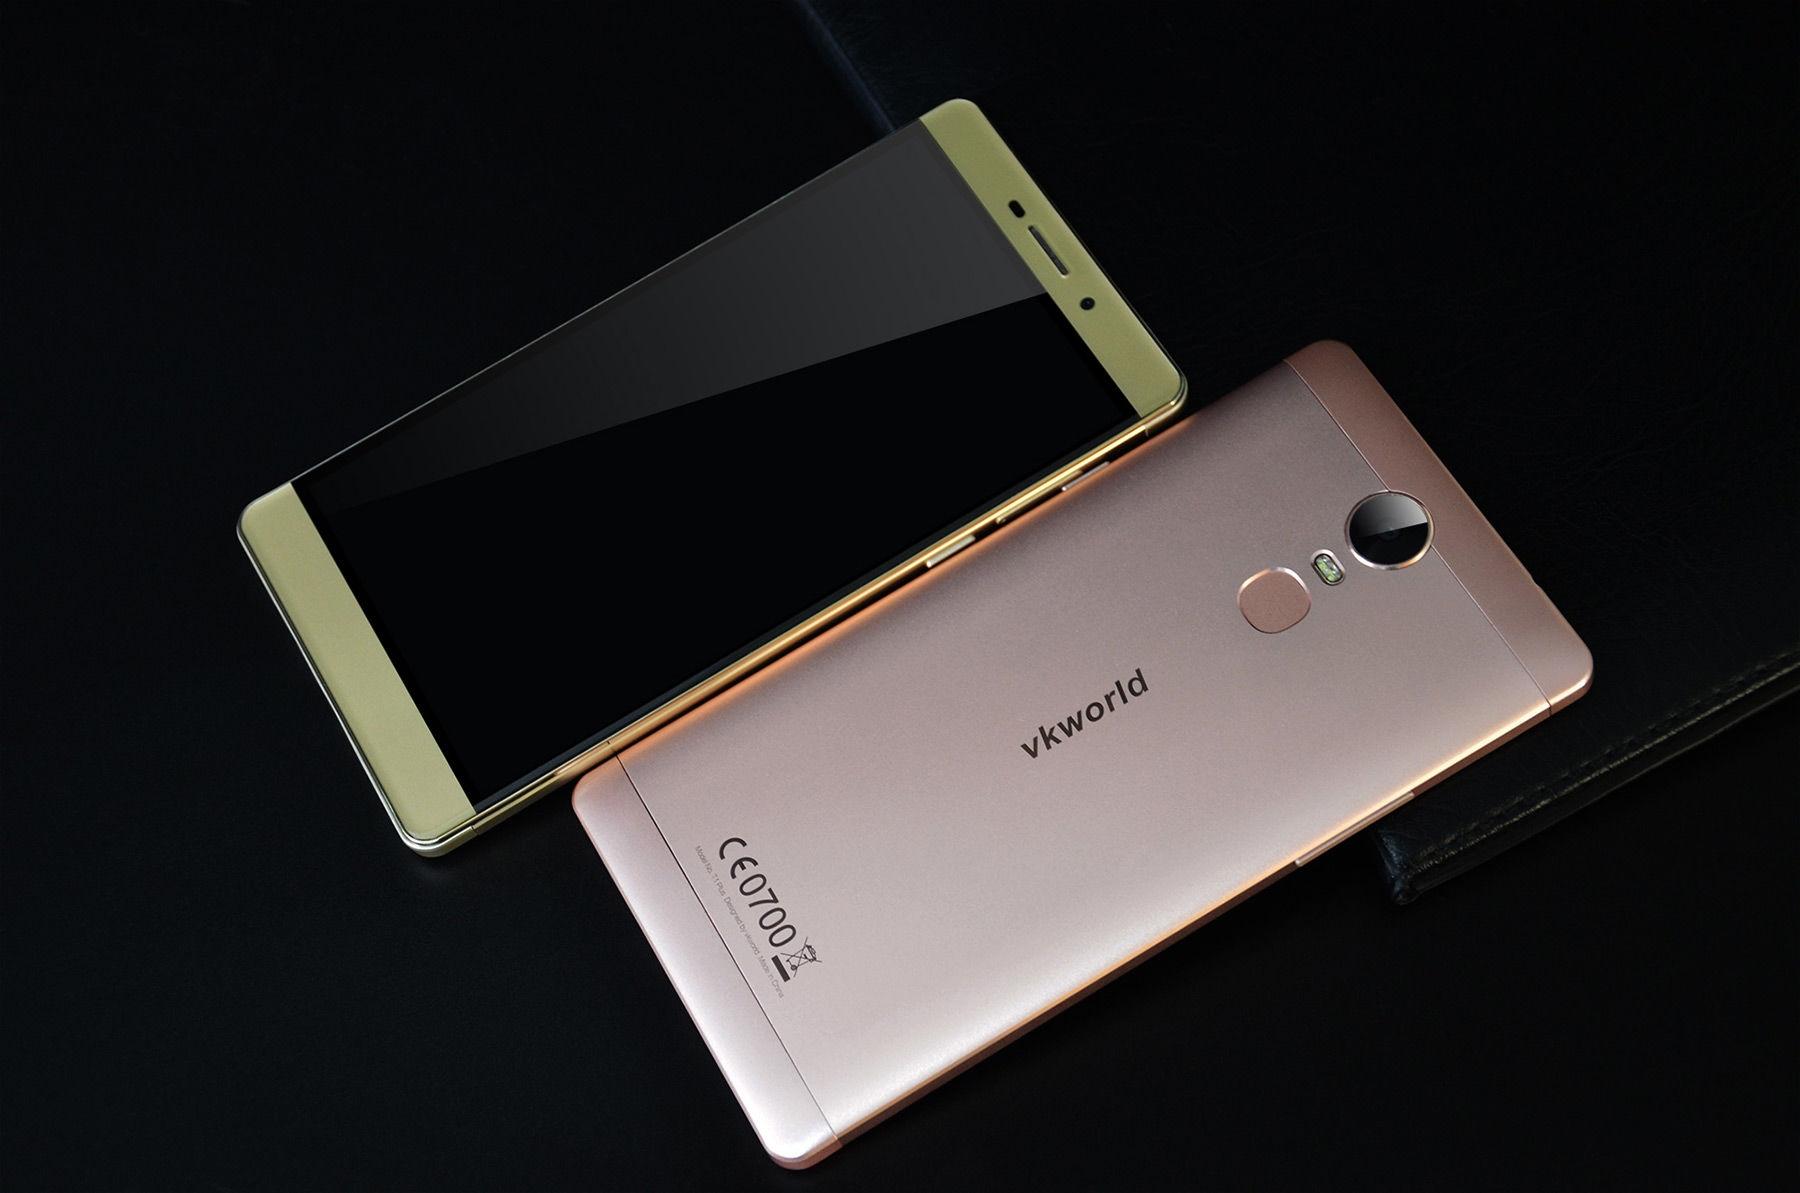 Vkworld T1 Plus Android 6.0 6.0 inch 4G Phablet MTK6735 Quad Core 1.0GHz 2GB RAM 16GB ROM 13.0MP Rear Camera Fingerprint Scanner GPS